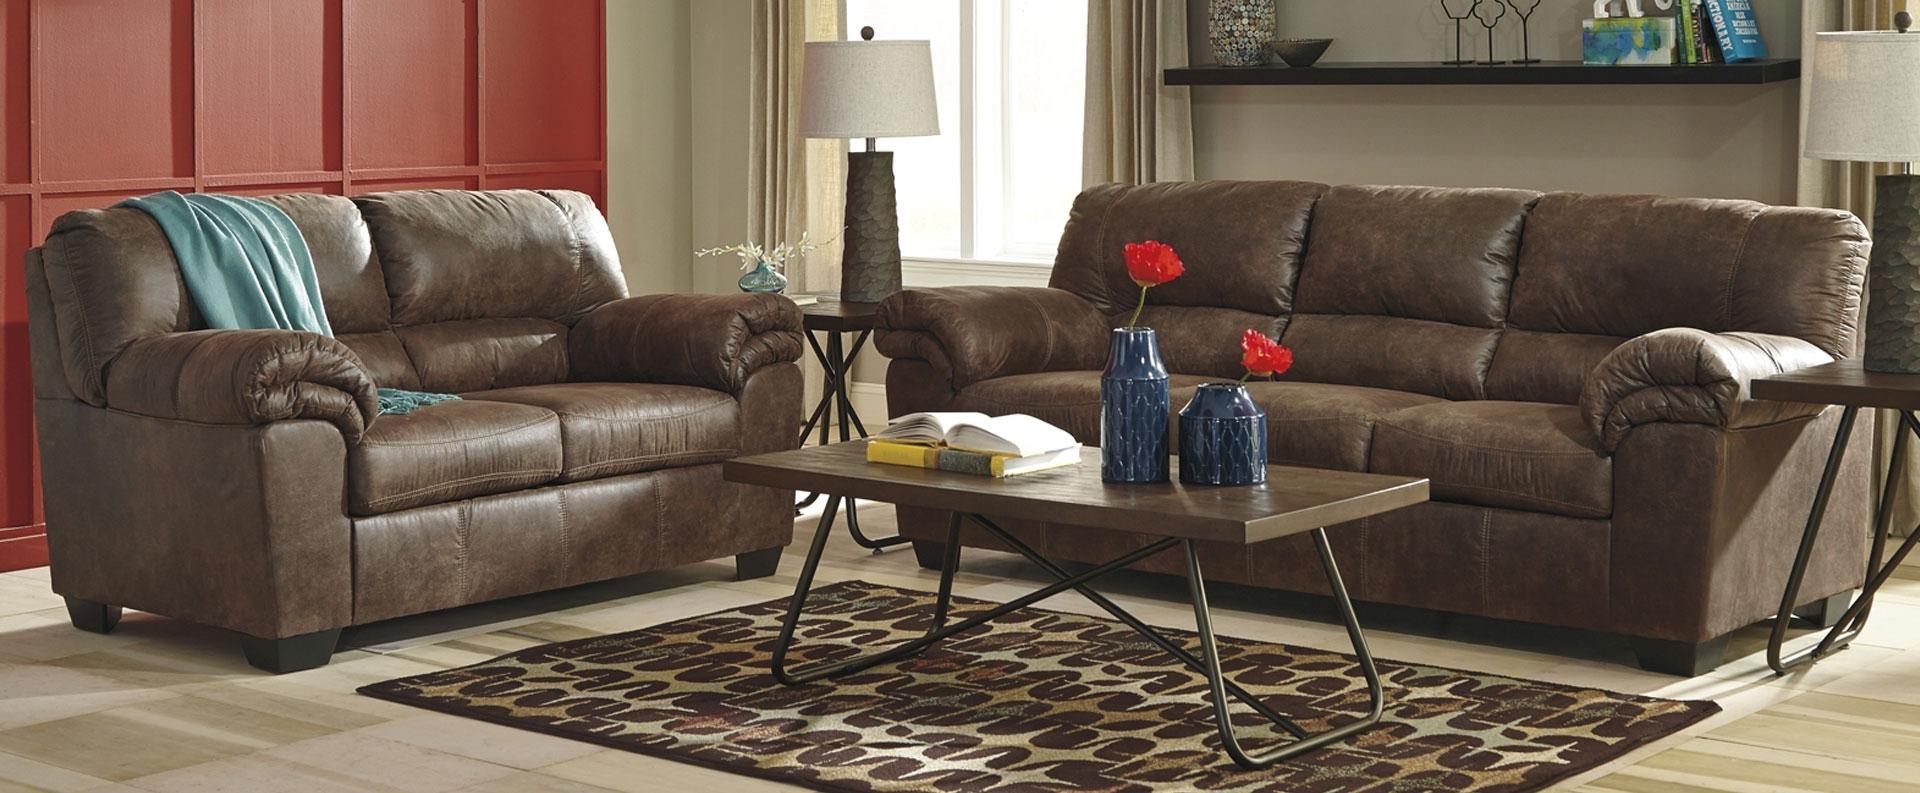 Sofar Worcester Furniture Stores In Ma Jordans Sectional Sofas With Jordans Sectional Sofas (Image 8 of 10)